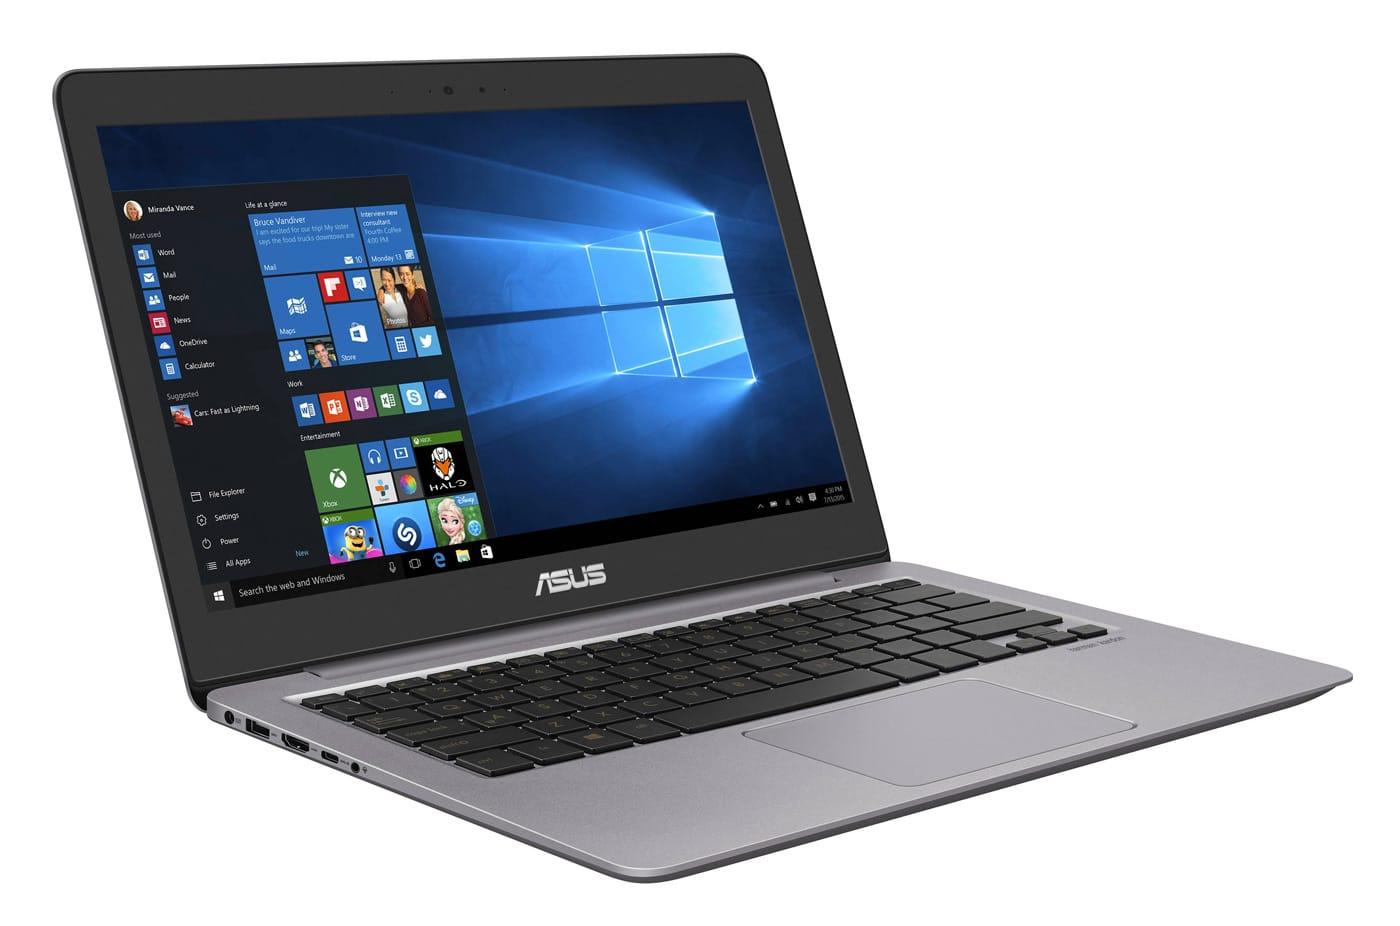 Asus ZenBook UX310UA-FC712T, Ultrabook 13 pouces IPS i5 Kaby (599€)